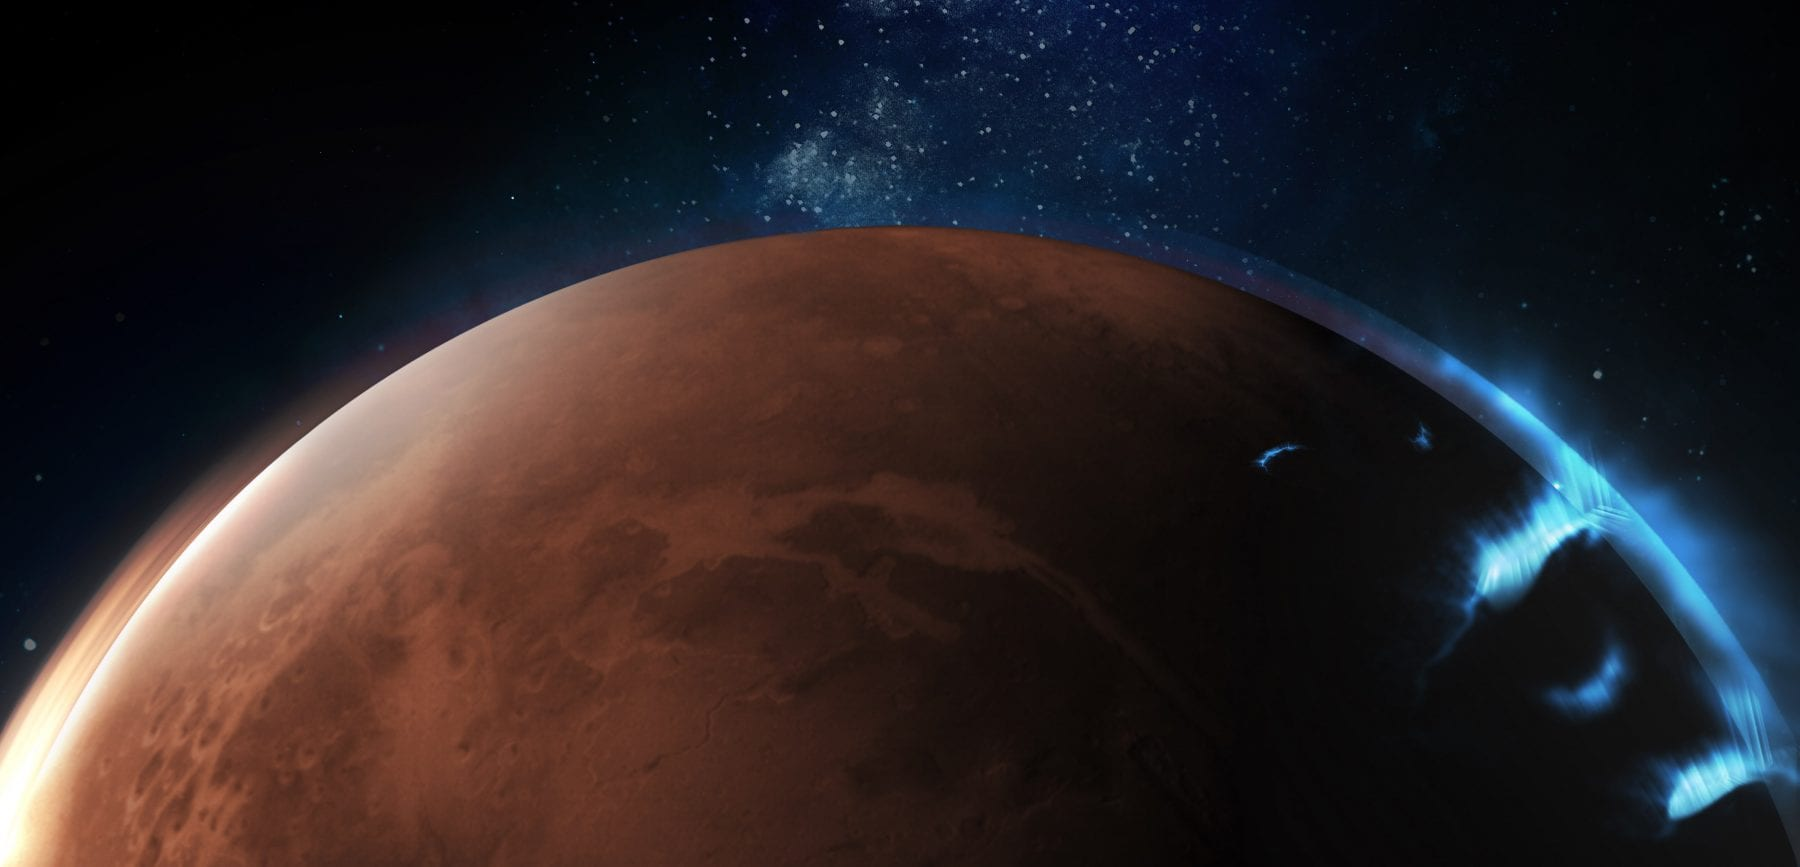 Artist's impression of the auroras on Mars. Credit: Emirates Mars Mission